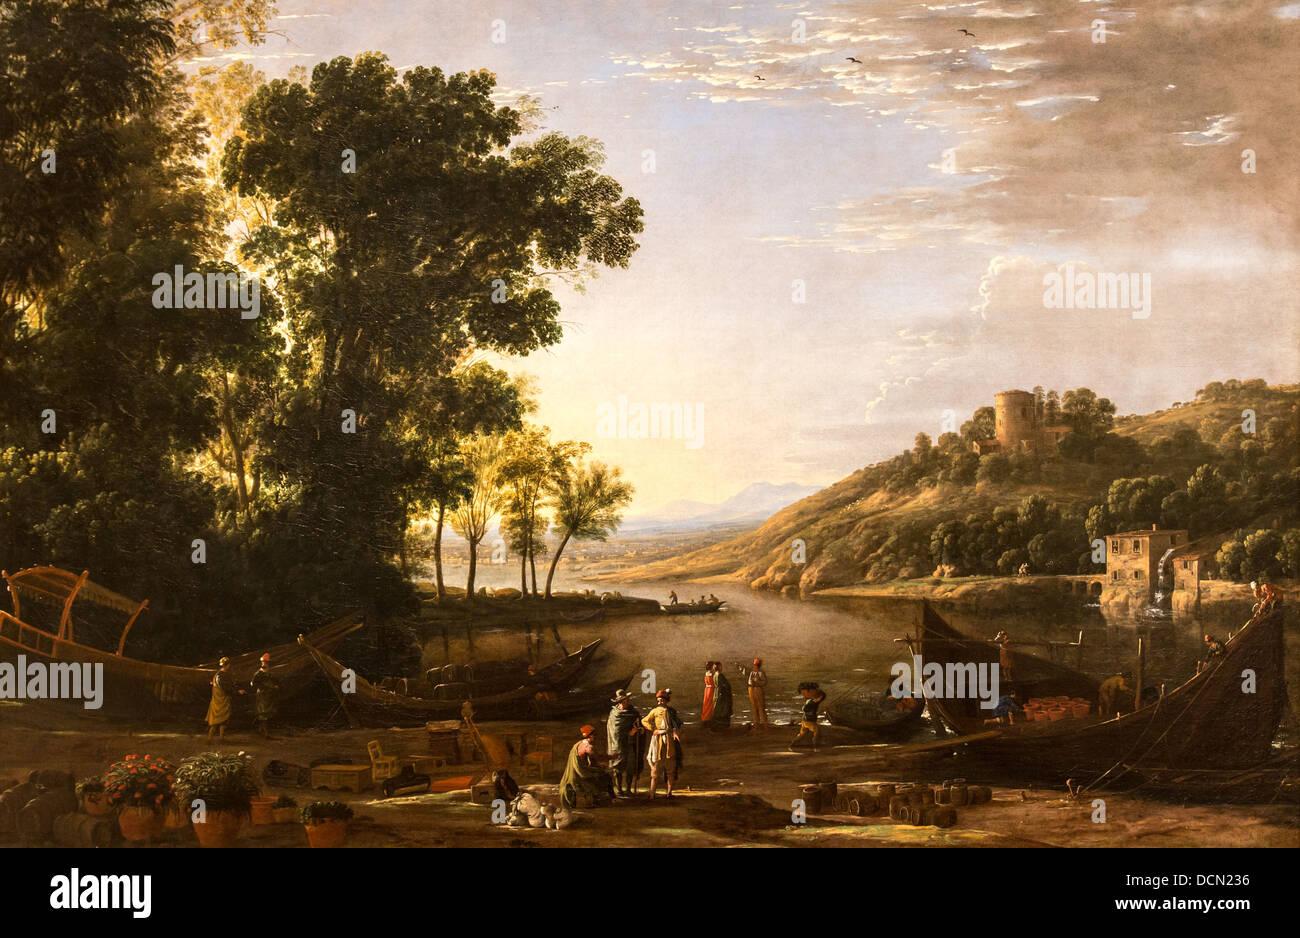 17th century  -  Landscape with Merchants, 1630 - Claude Lorrain Philippe Sauvan-Magnet / Active Museum - Stock Image